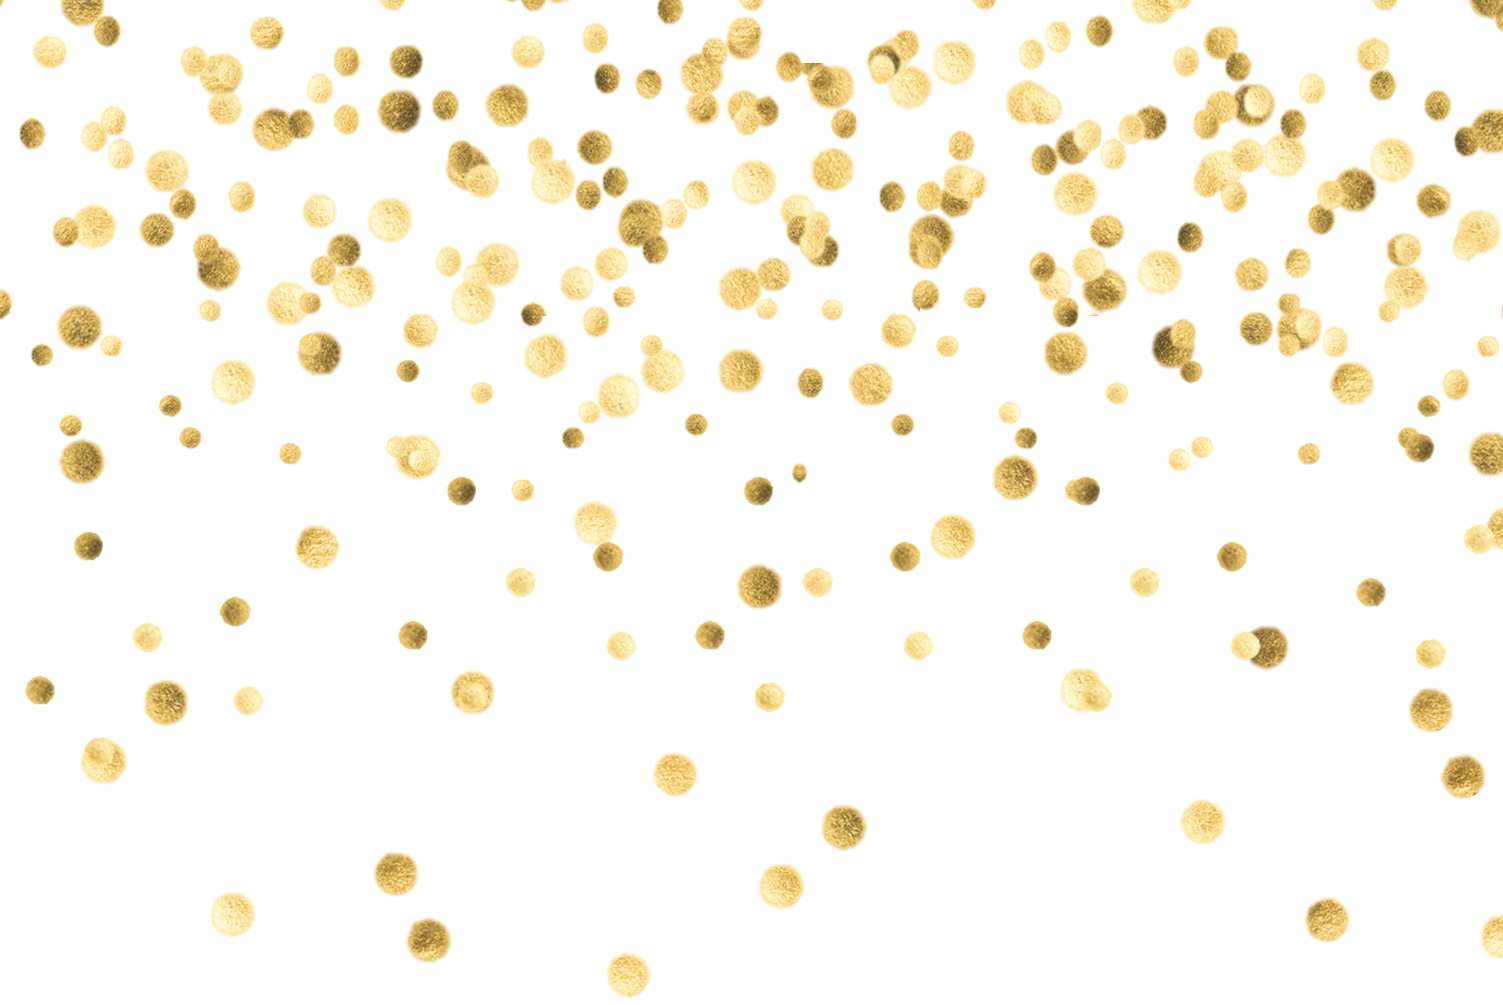 White clipart confetti. Image result for transparent